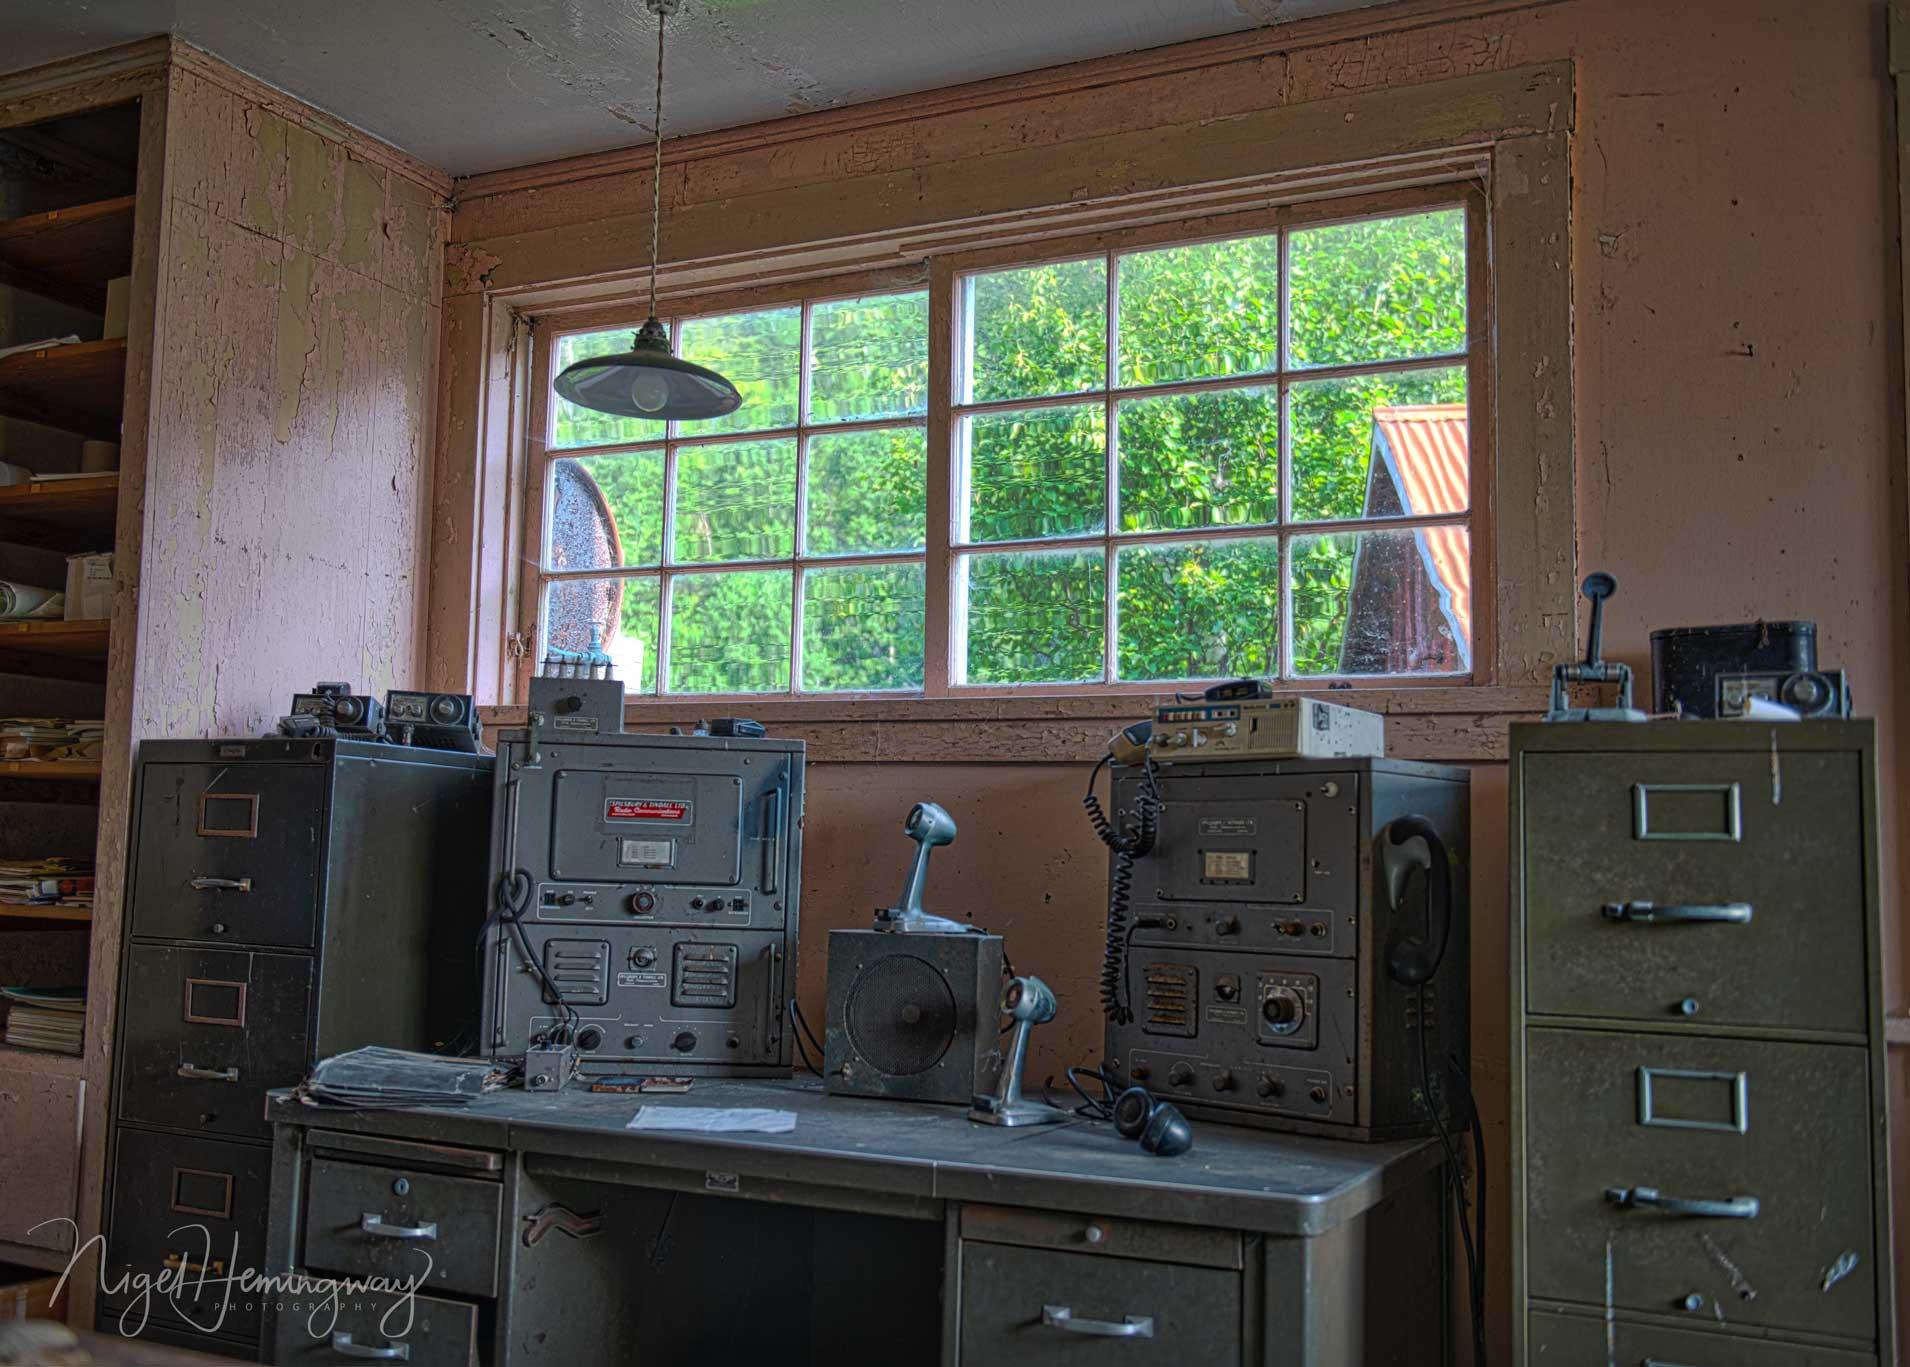 Radio-Room-HDR2 - Nigel Hemingway